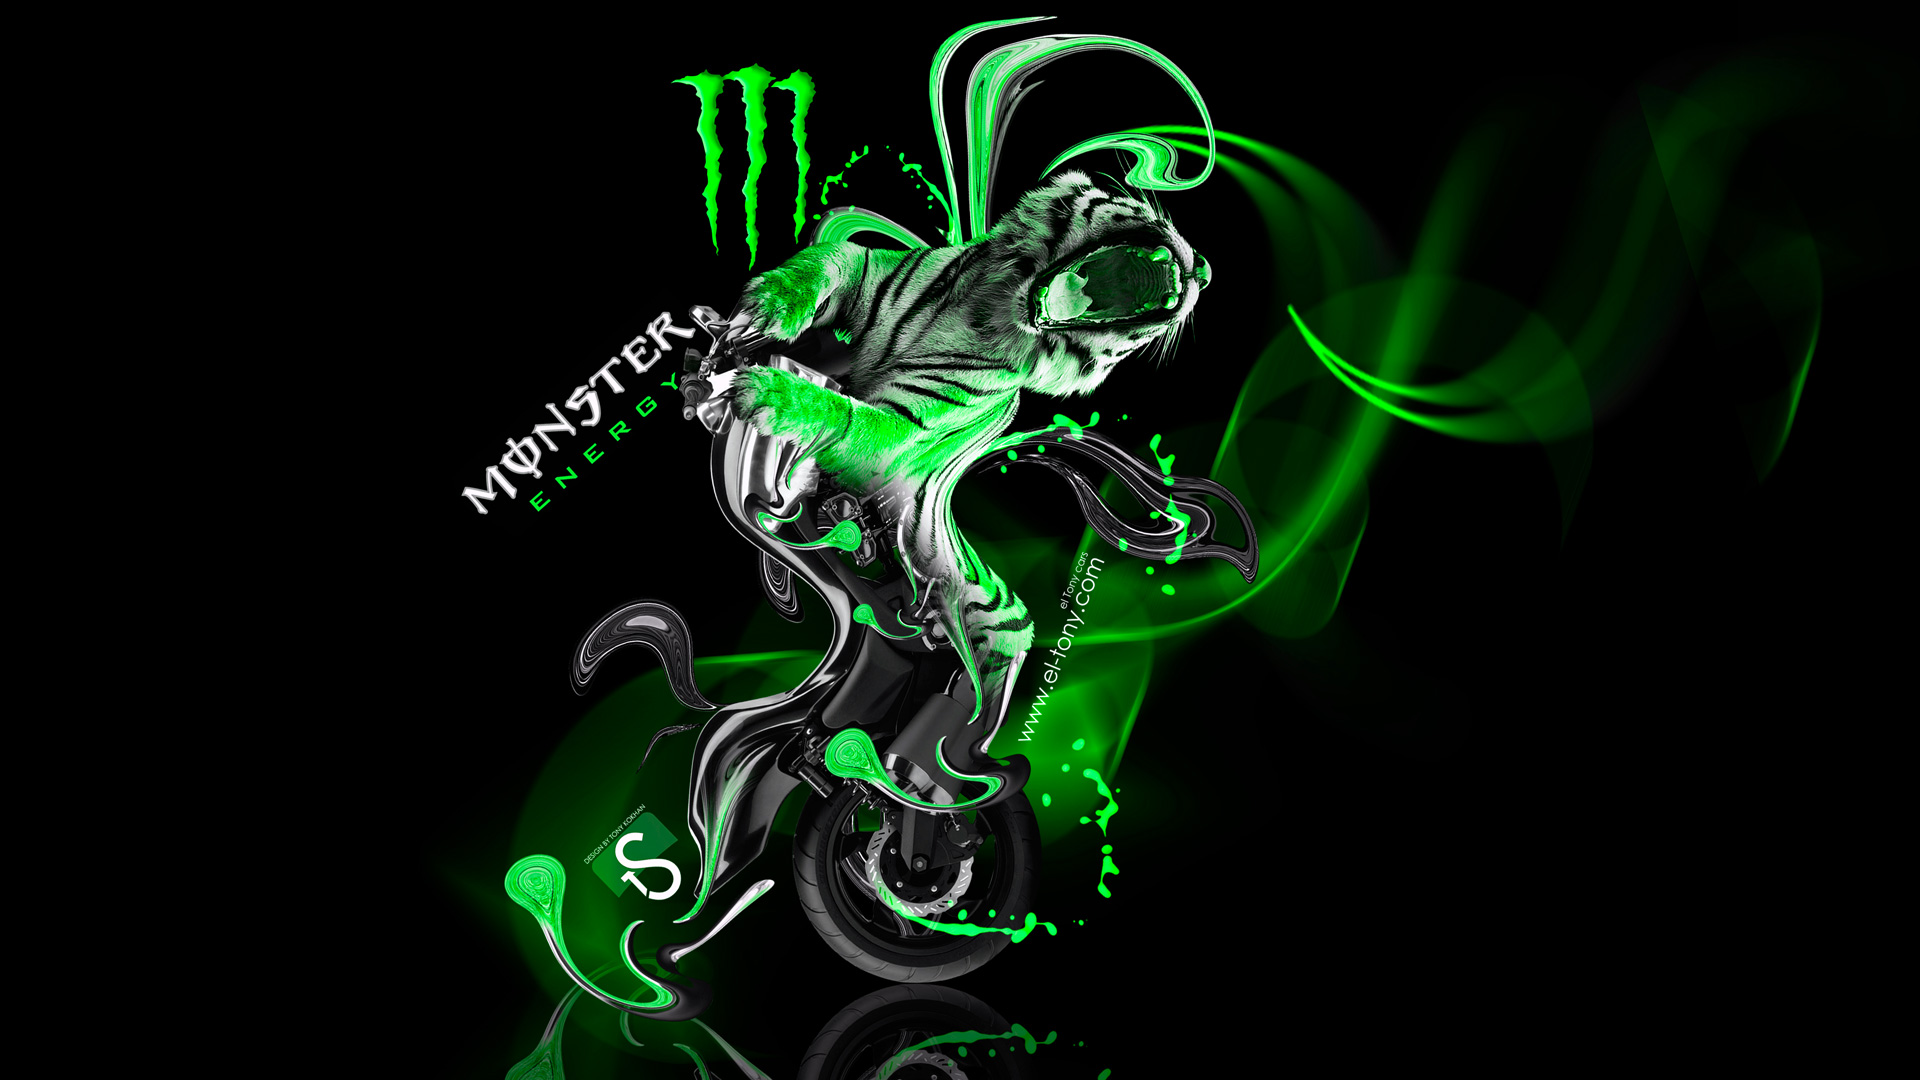 Monster Energy Moto Yamaha Vmax Fantasy Green Neon Plastic Tiger Bike 1920x1080